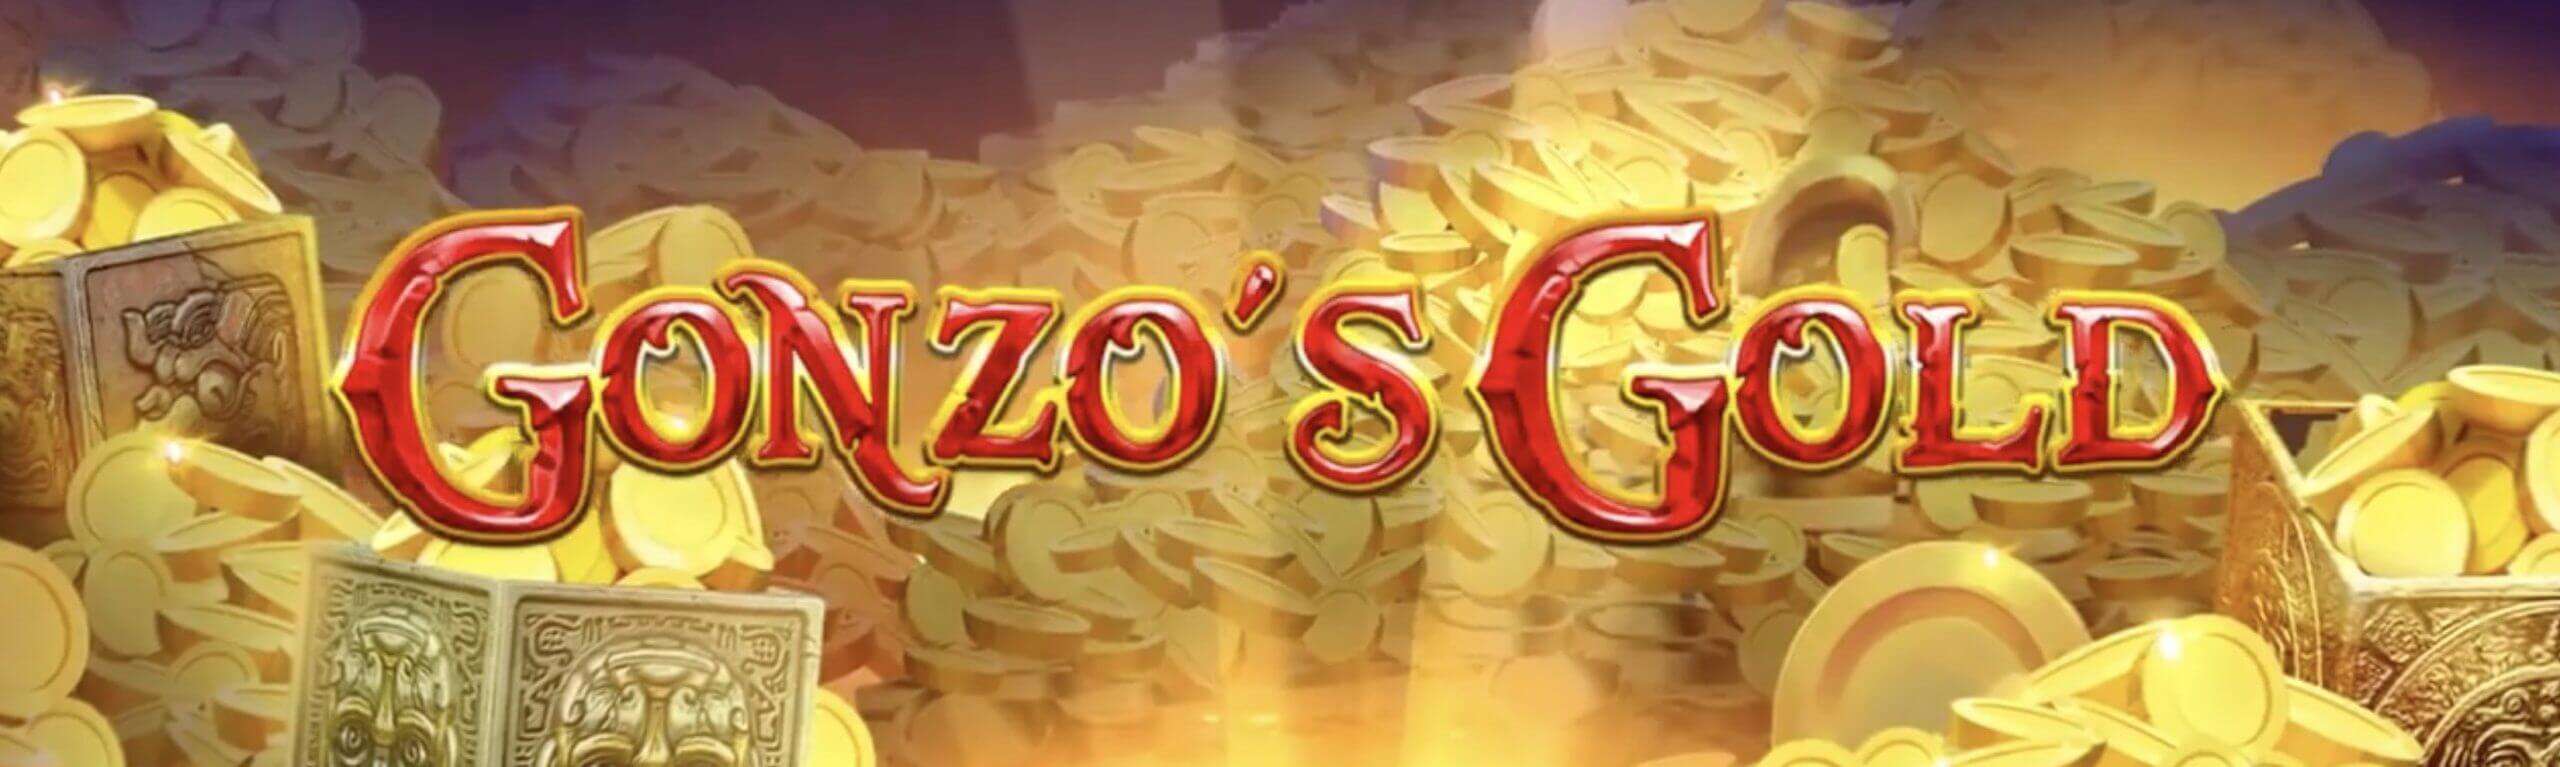 Gonzos Gold NetEnt CS